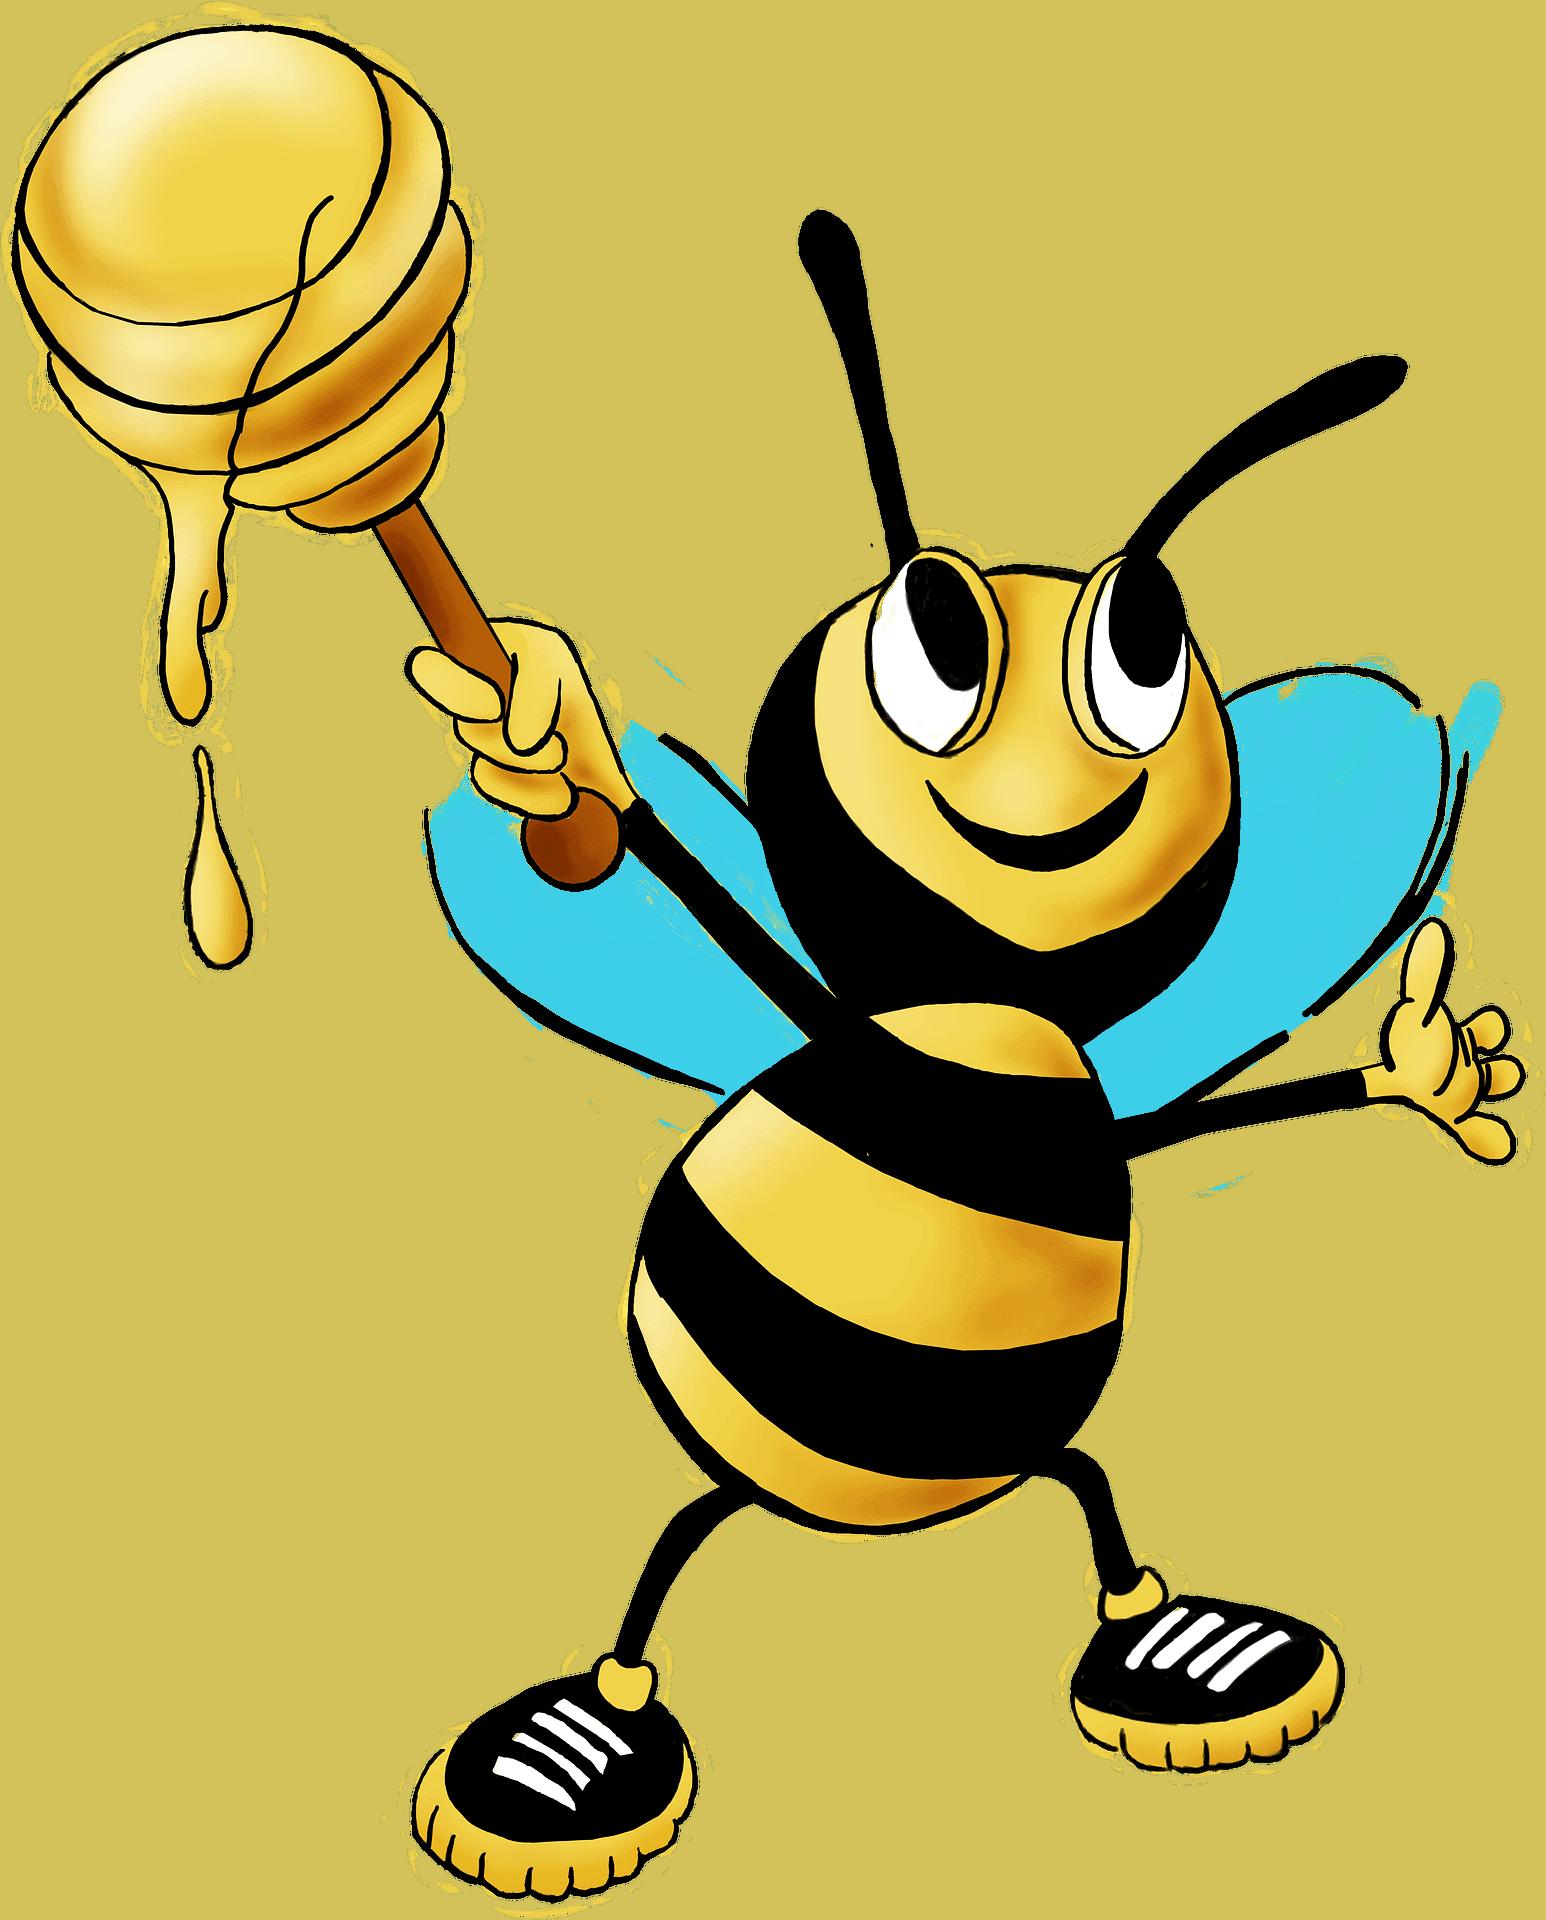 Honey adulteration